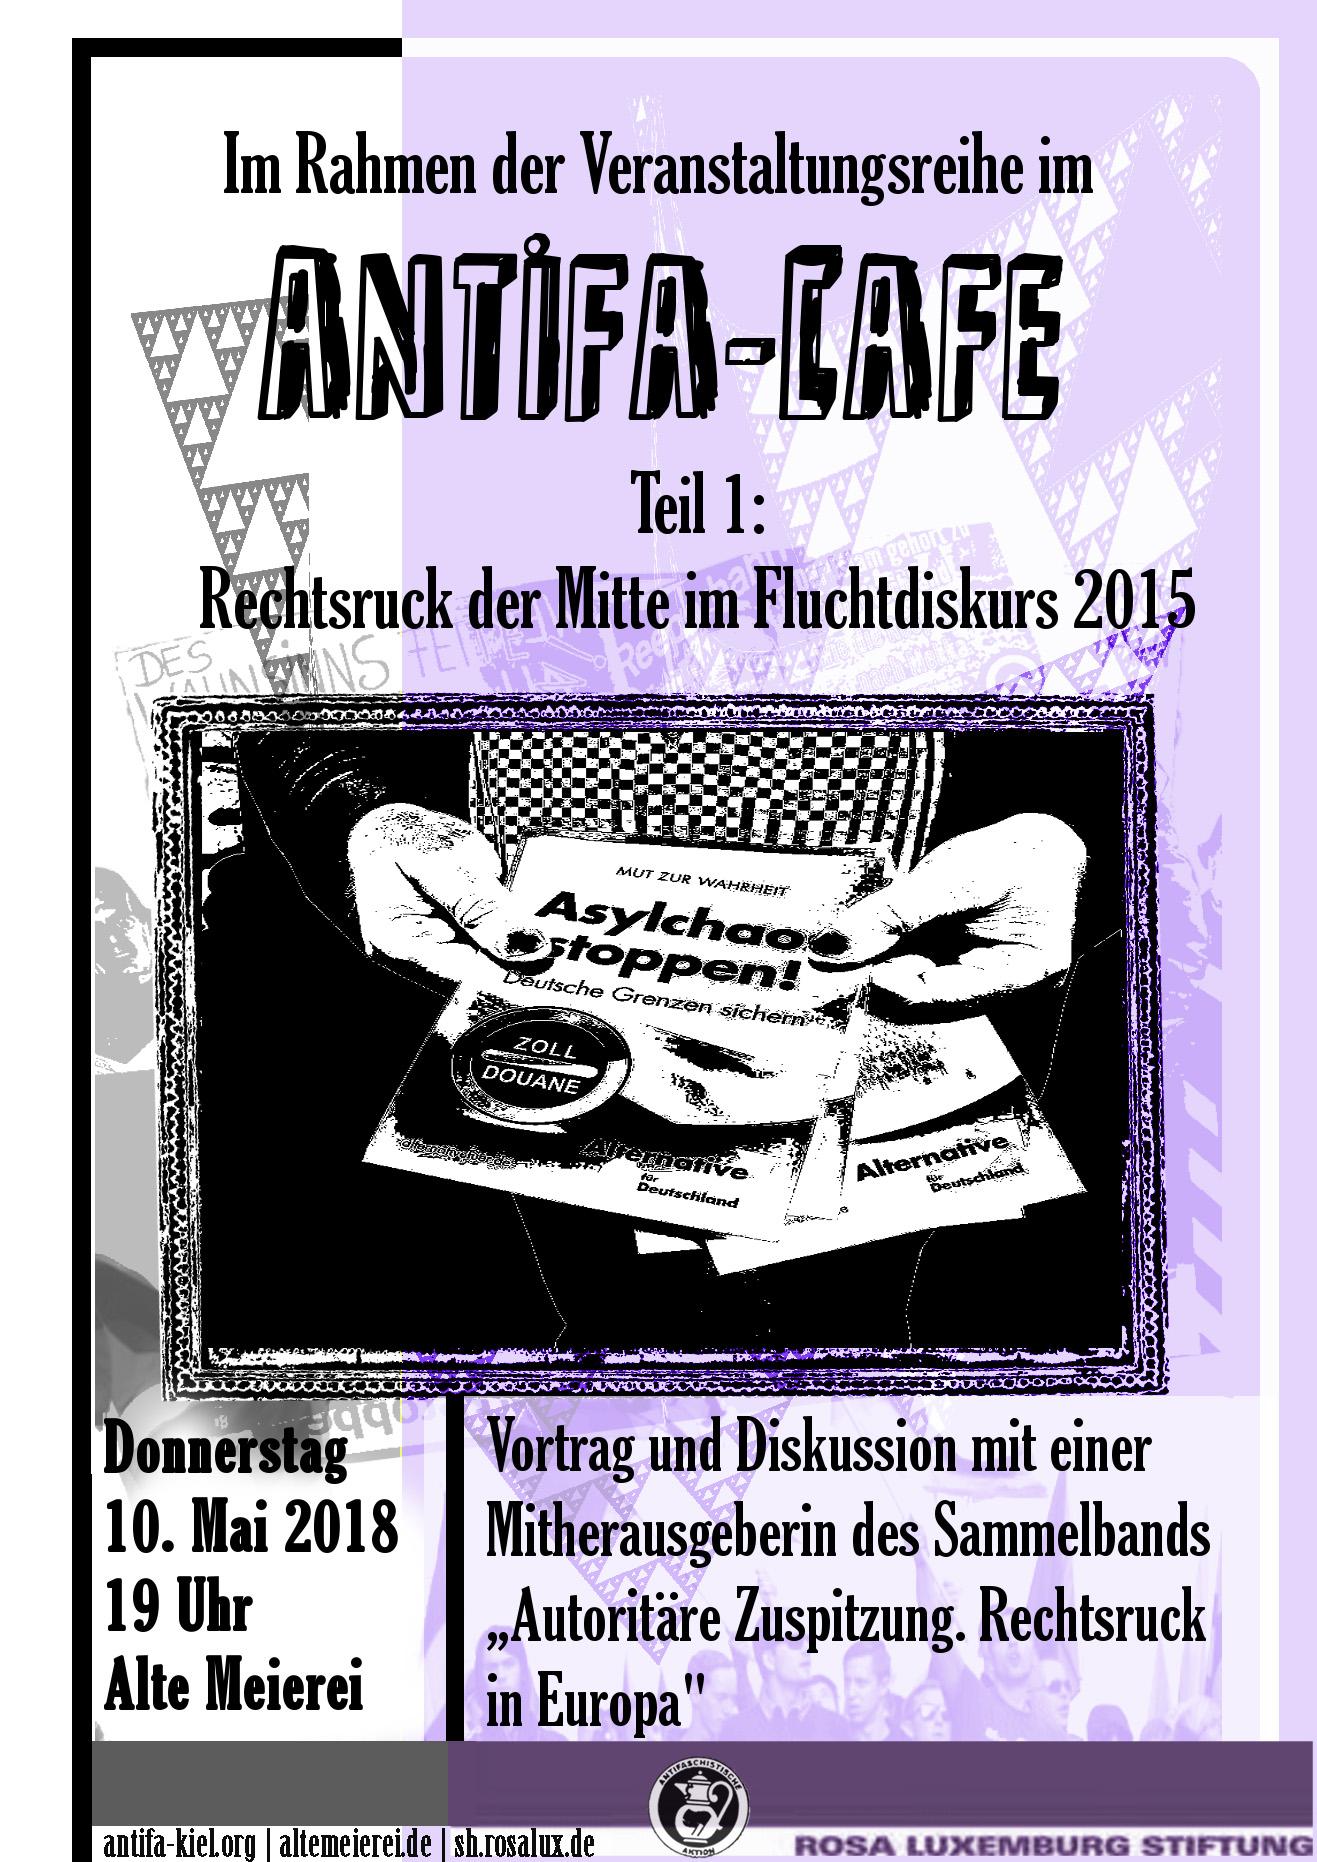 http://www.neu.antifa-kiel.org/wp-content/uploads/import/antifa-cafe/Einzelflyer Cafe reihe_mai.jpg